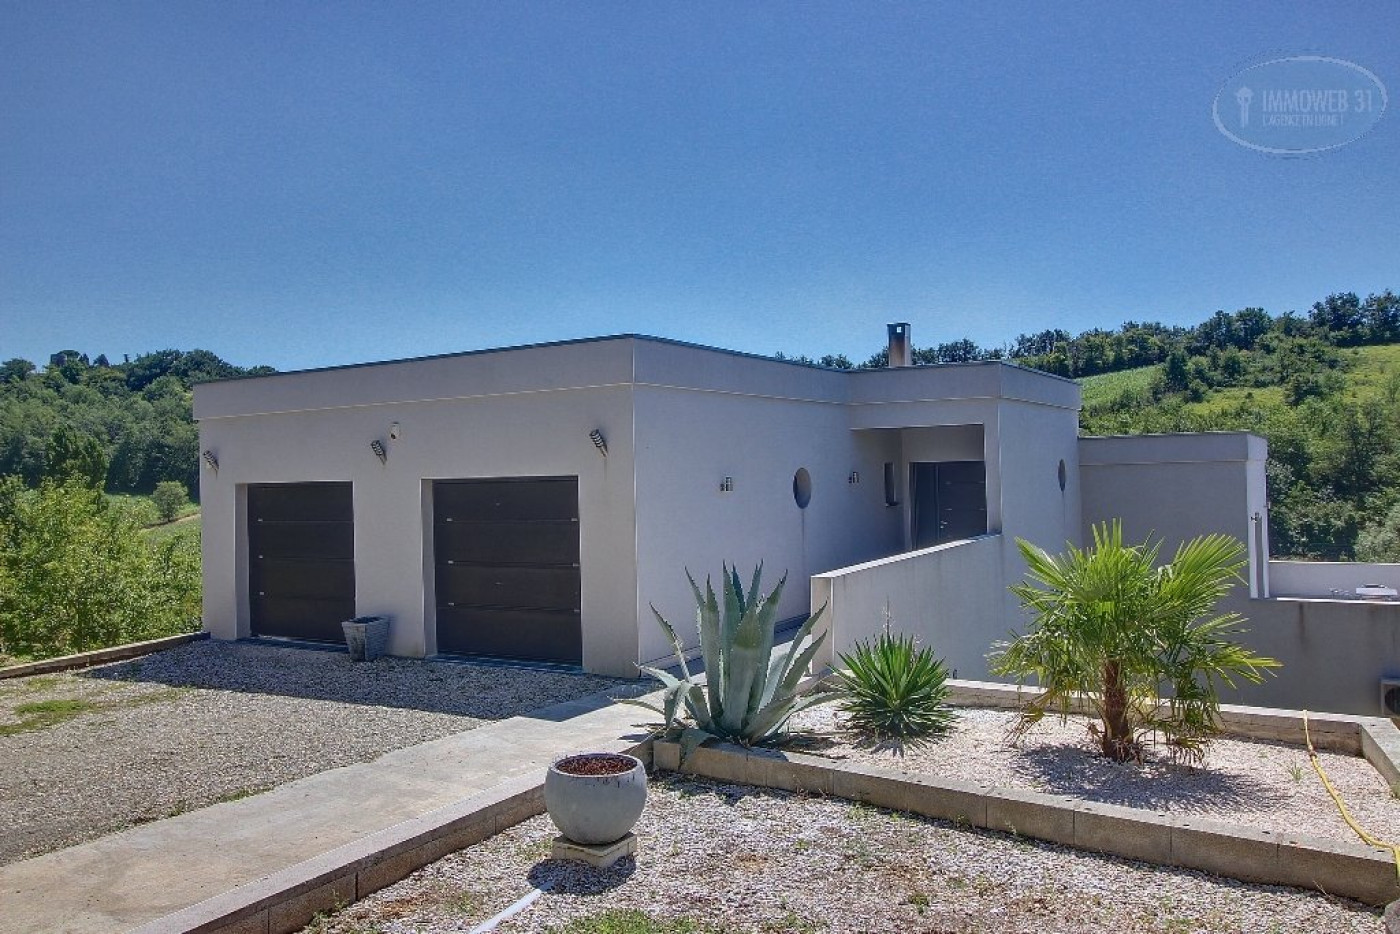 A vendre  Avignonet Lauragais | Réf 31161504 - Immoweb31